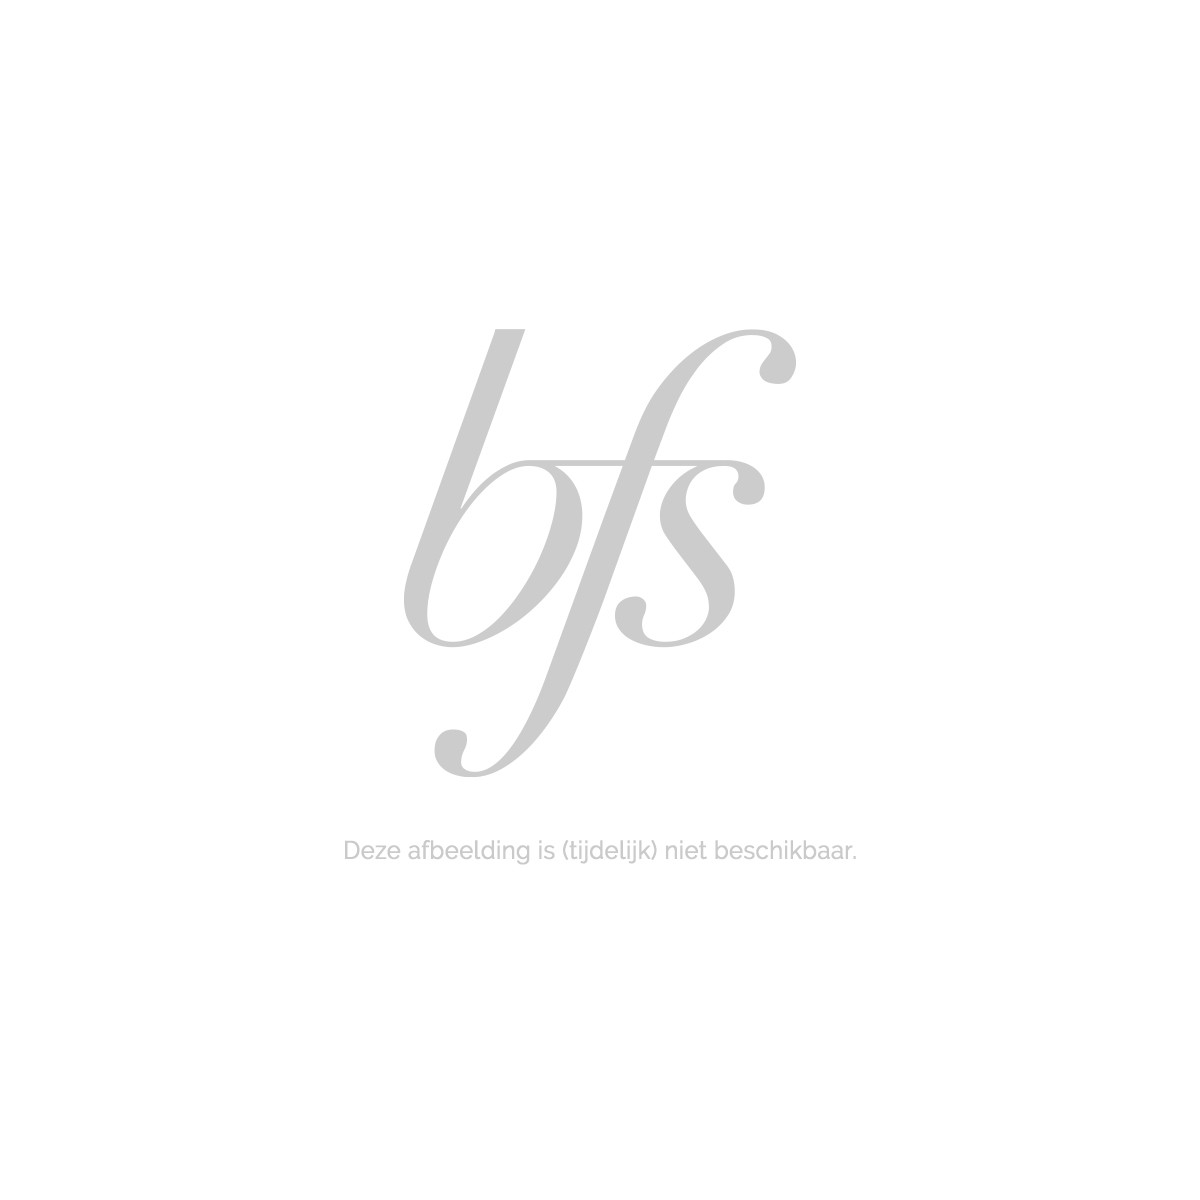 Bourjois Compact Powder Healthy Balance